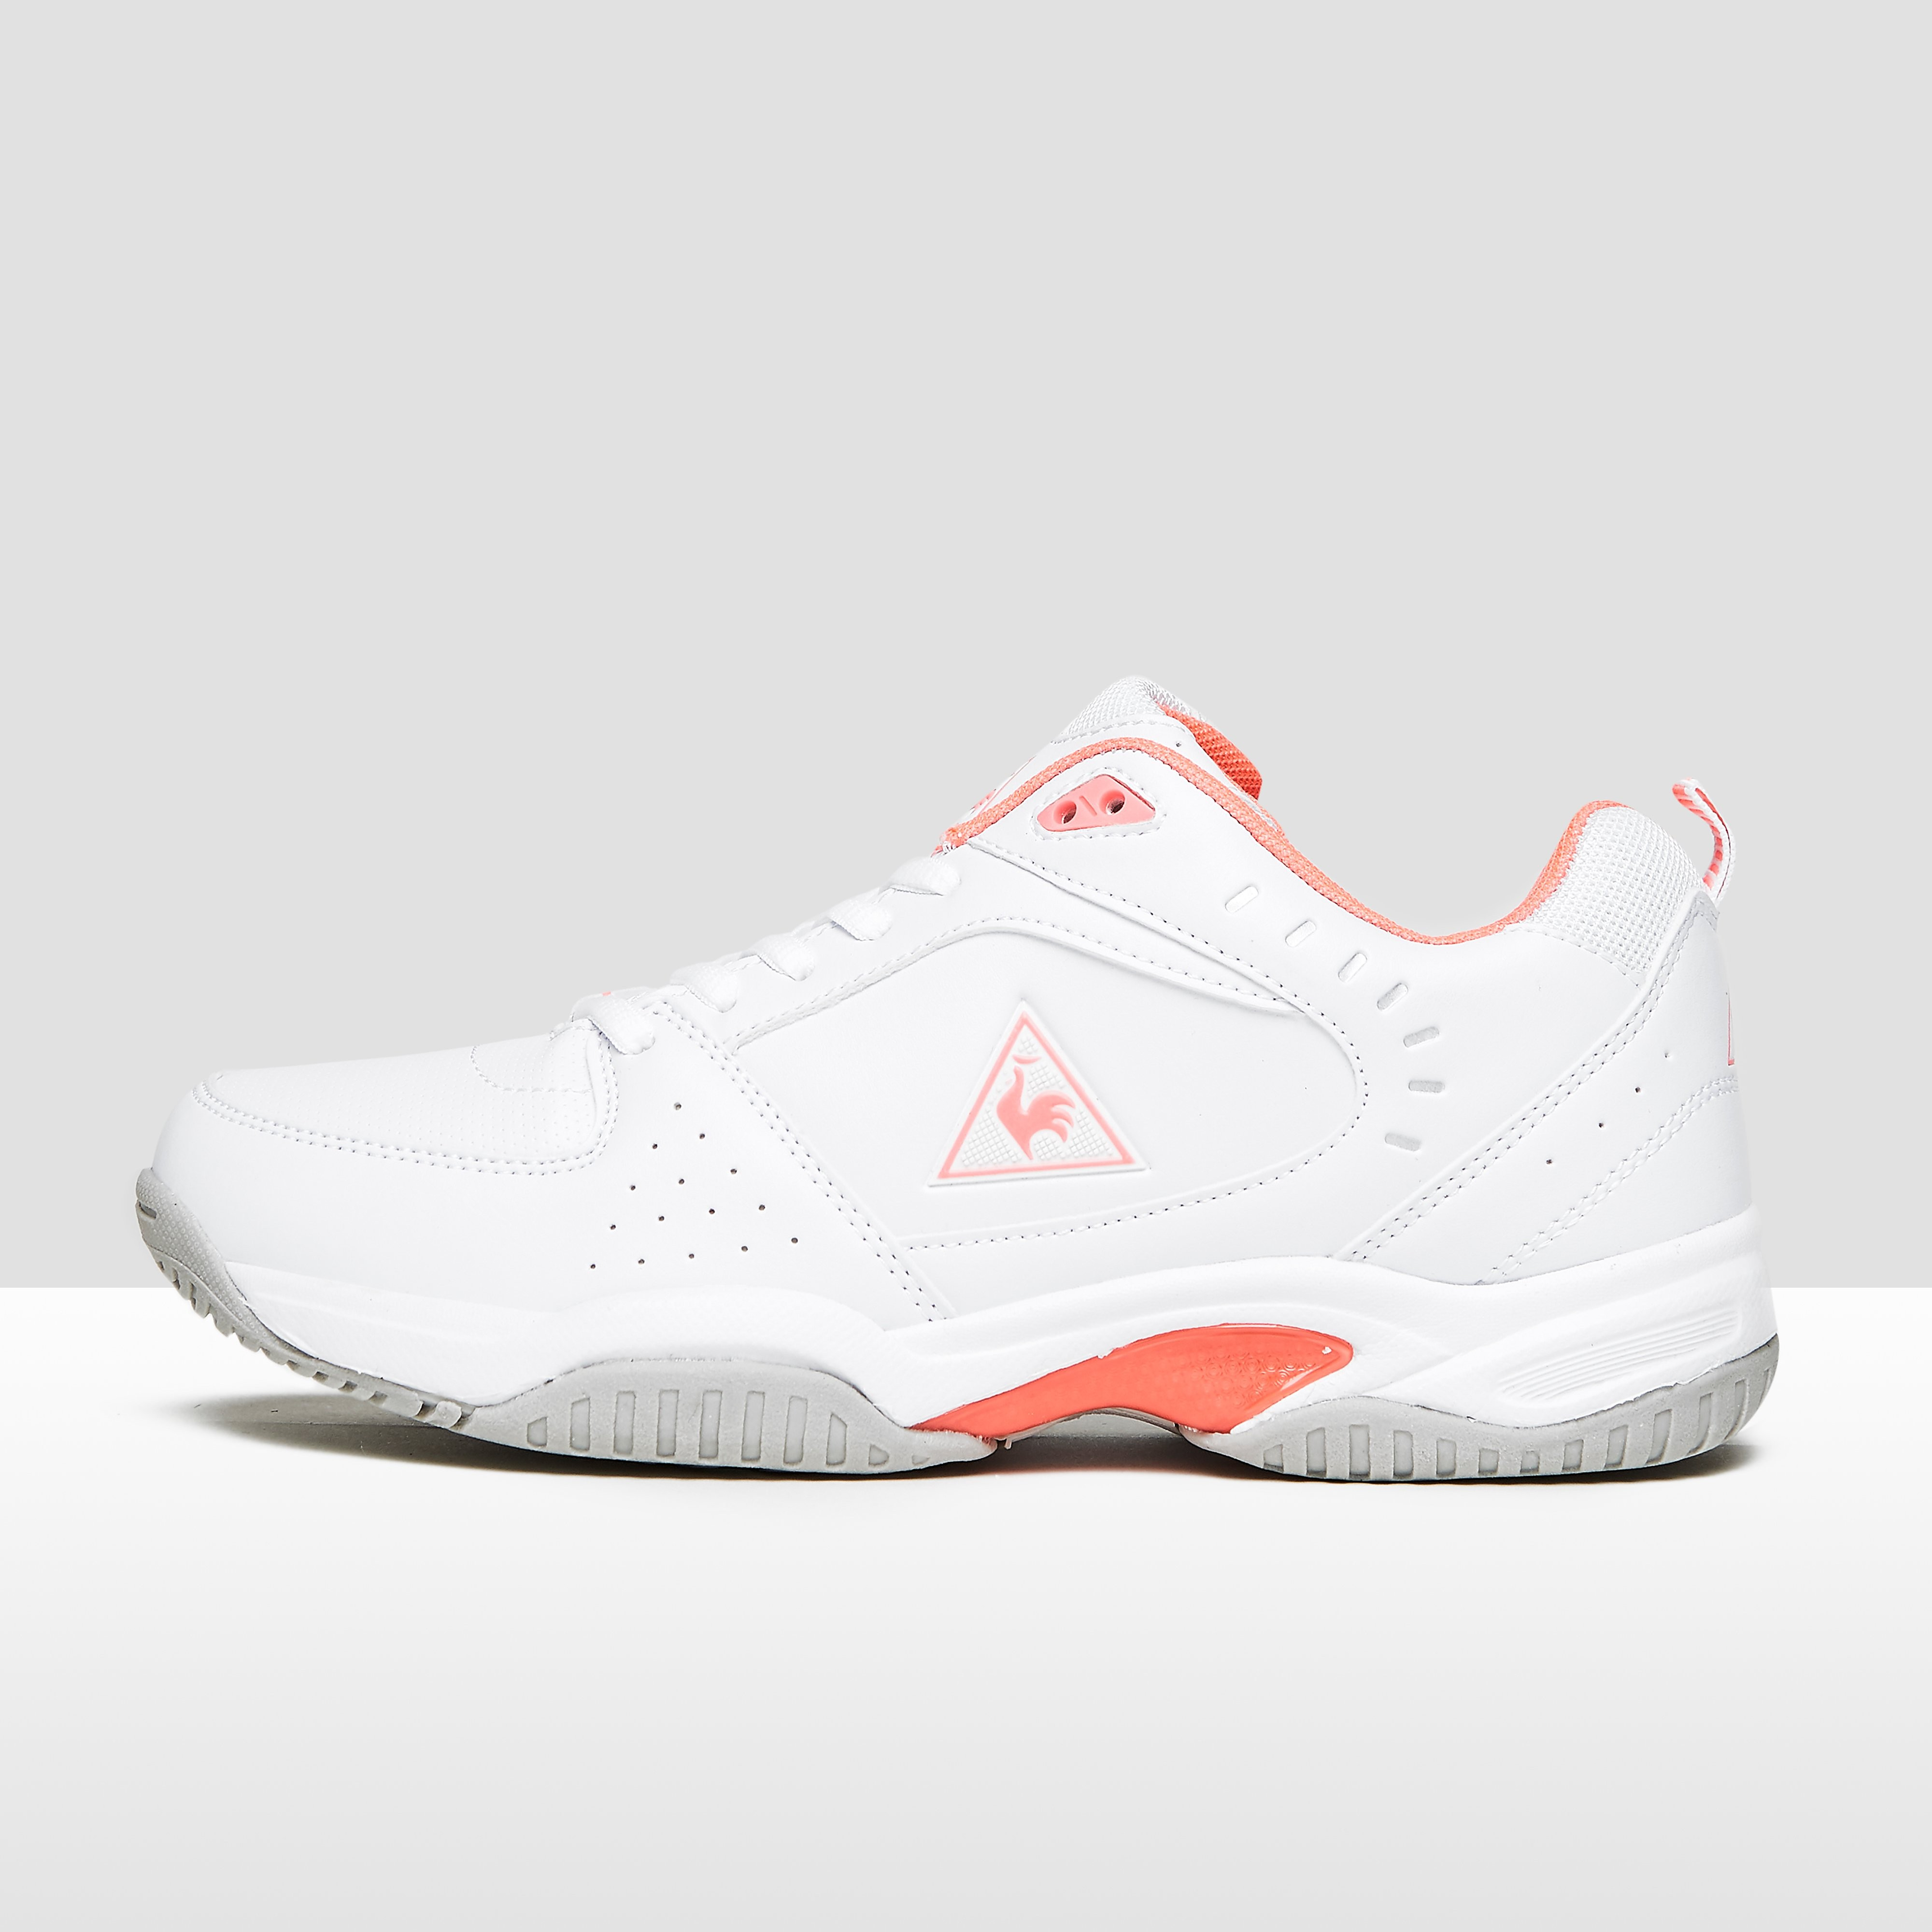 Womens Serena Tennis Tennisschoenen Wit/Roze Dames - White/Pink. Size - 42 thumbnail